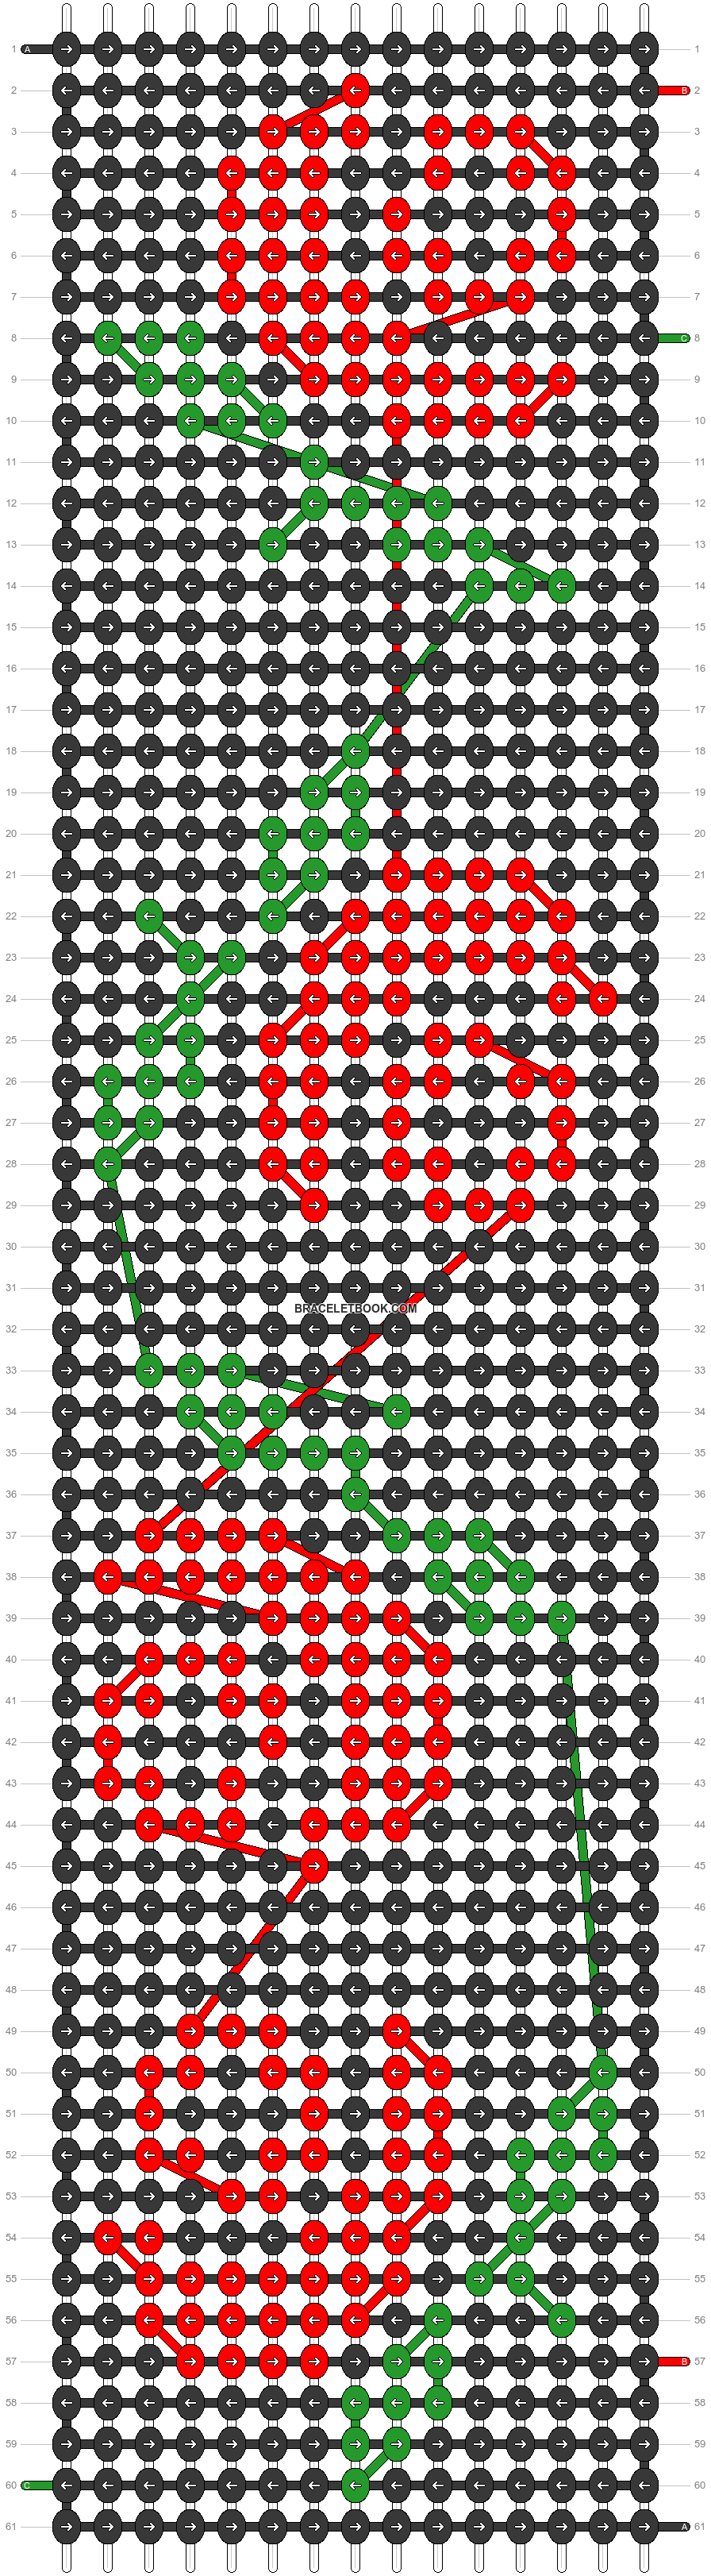 Alpha Pattern #21874 added by biancaplem